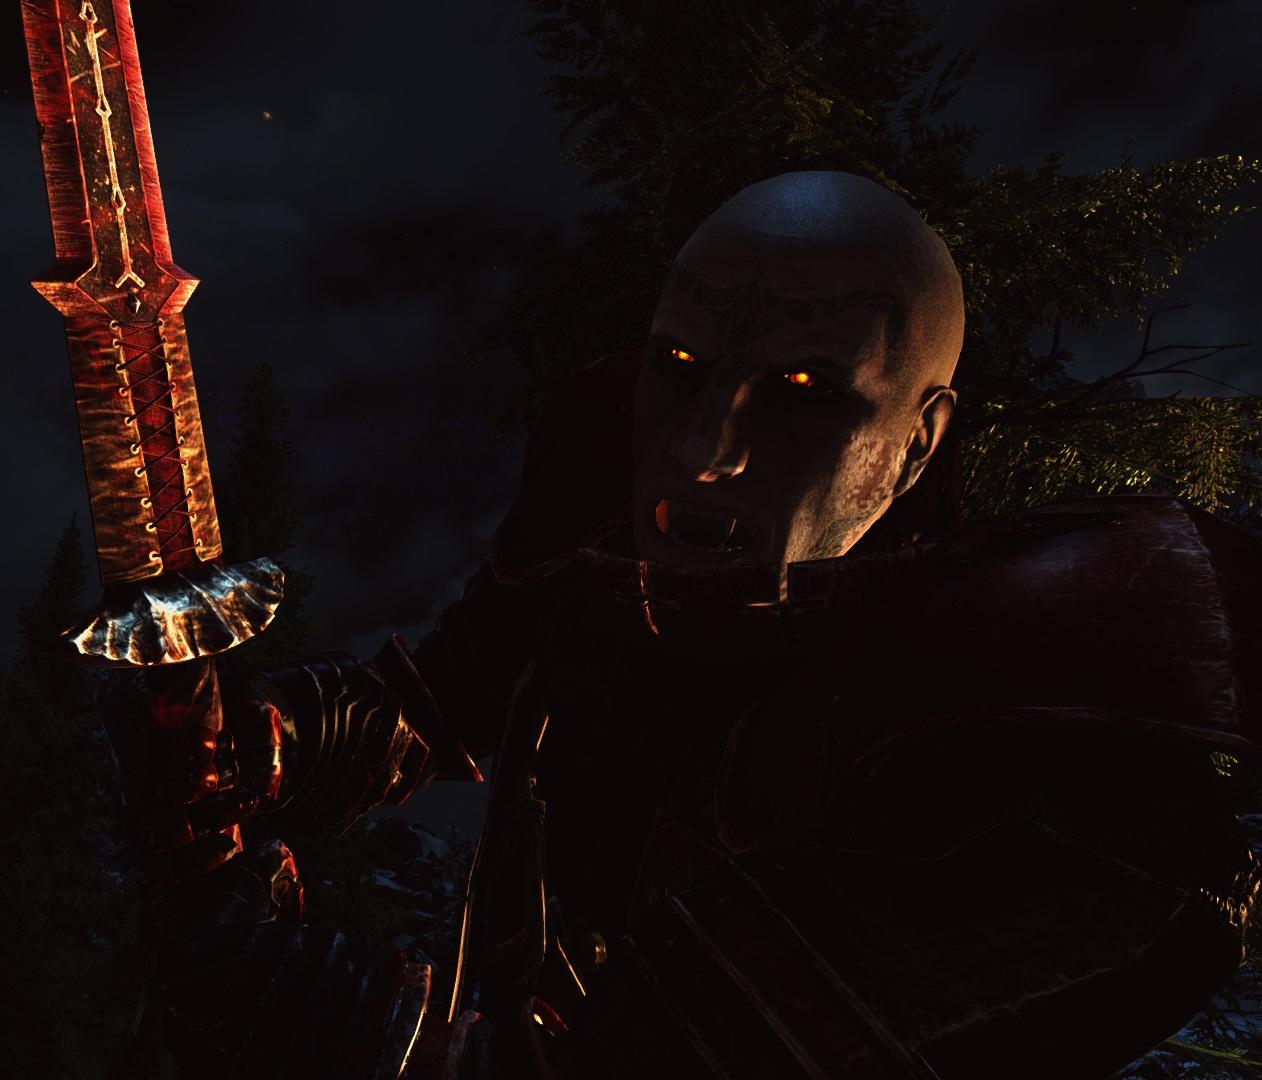 Ord - Elder Scrolls 5: Skyrim, the